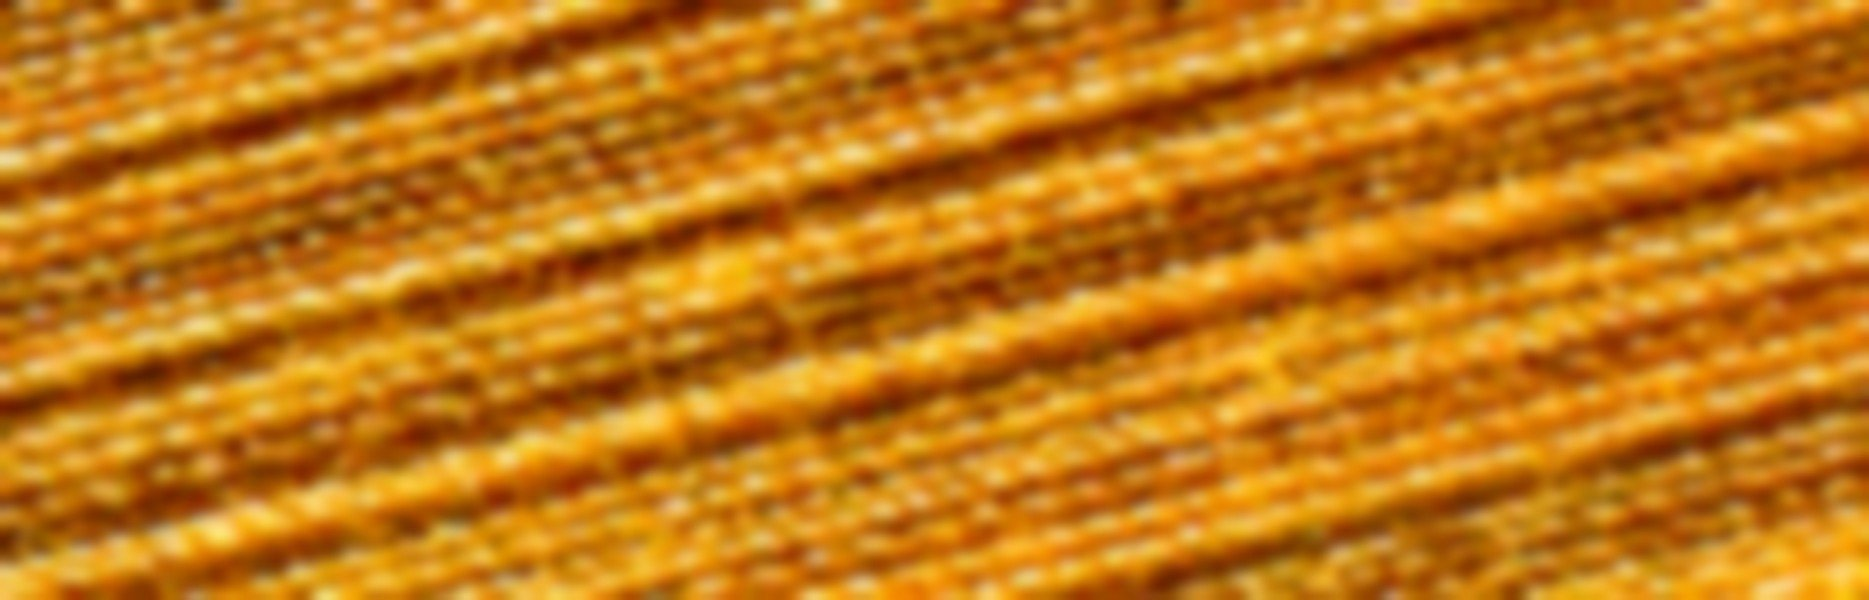 Cotton 40wt Thread 700yd - Variegated Peachy Tones